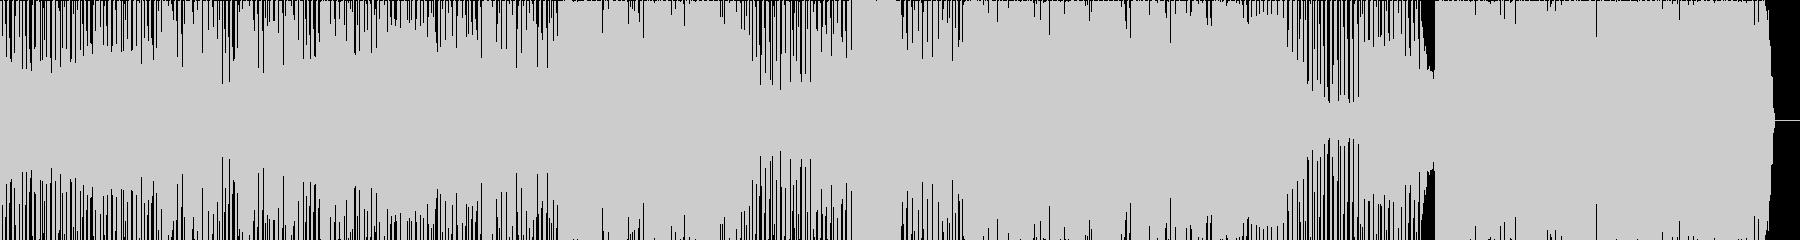 BLINDFOLD RIDEの未再生の波形